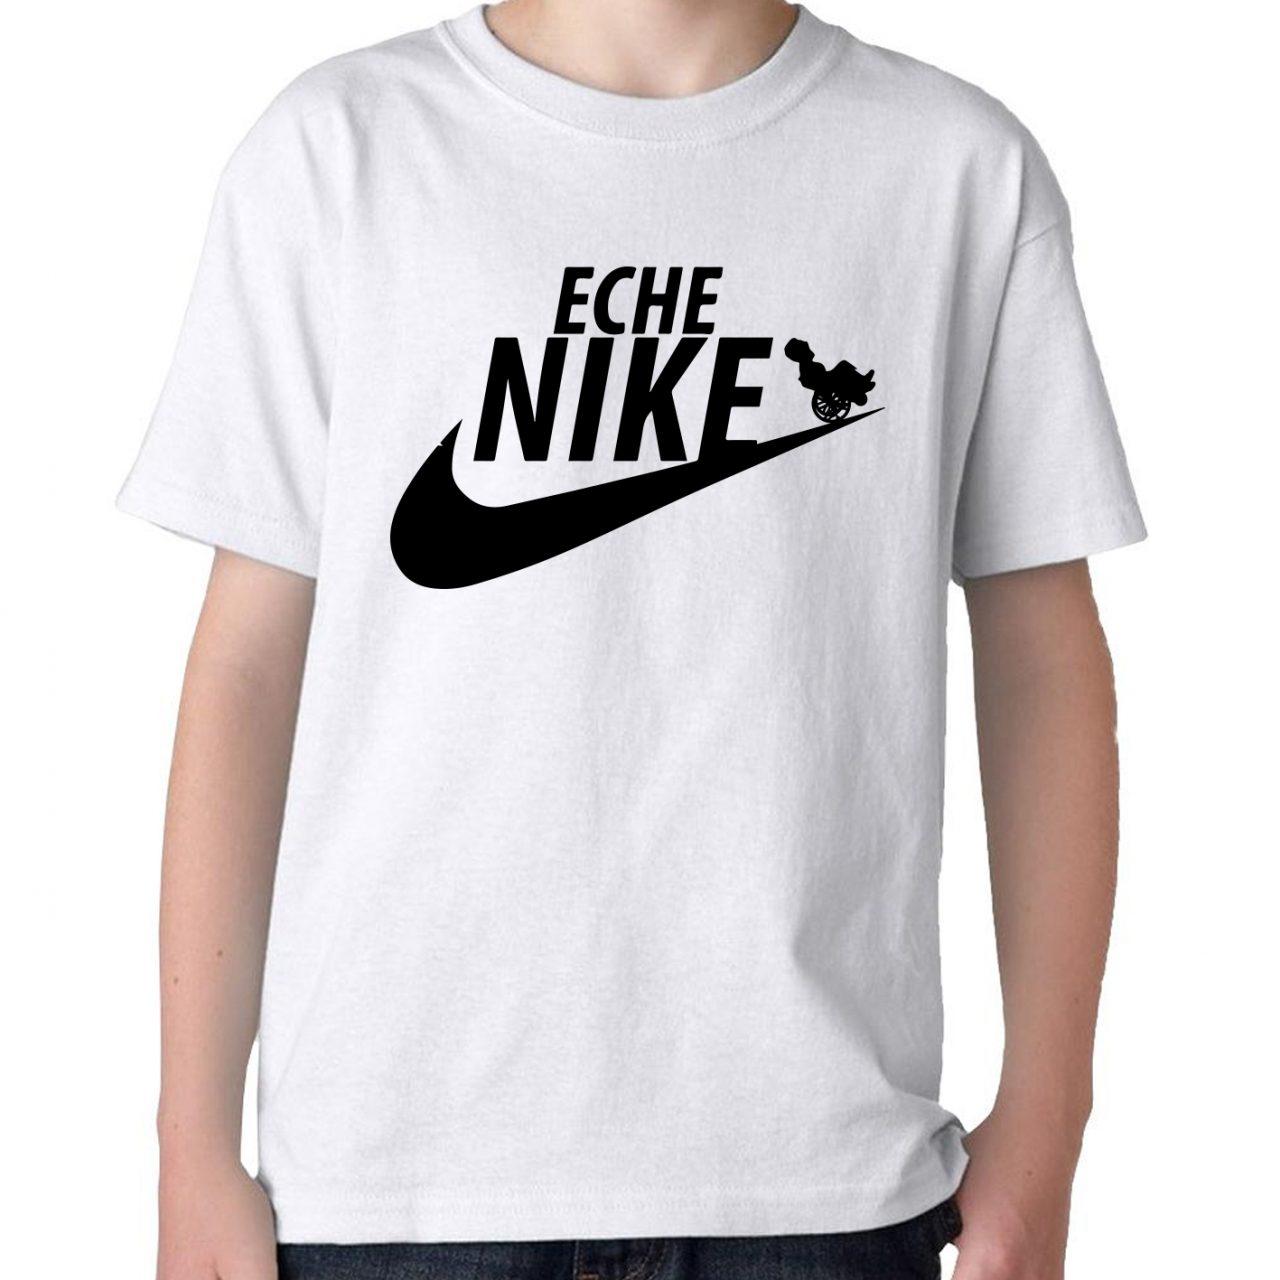 Eche Nike, la camiseta que estabas esperando